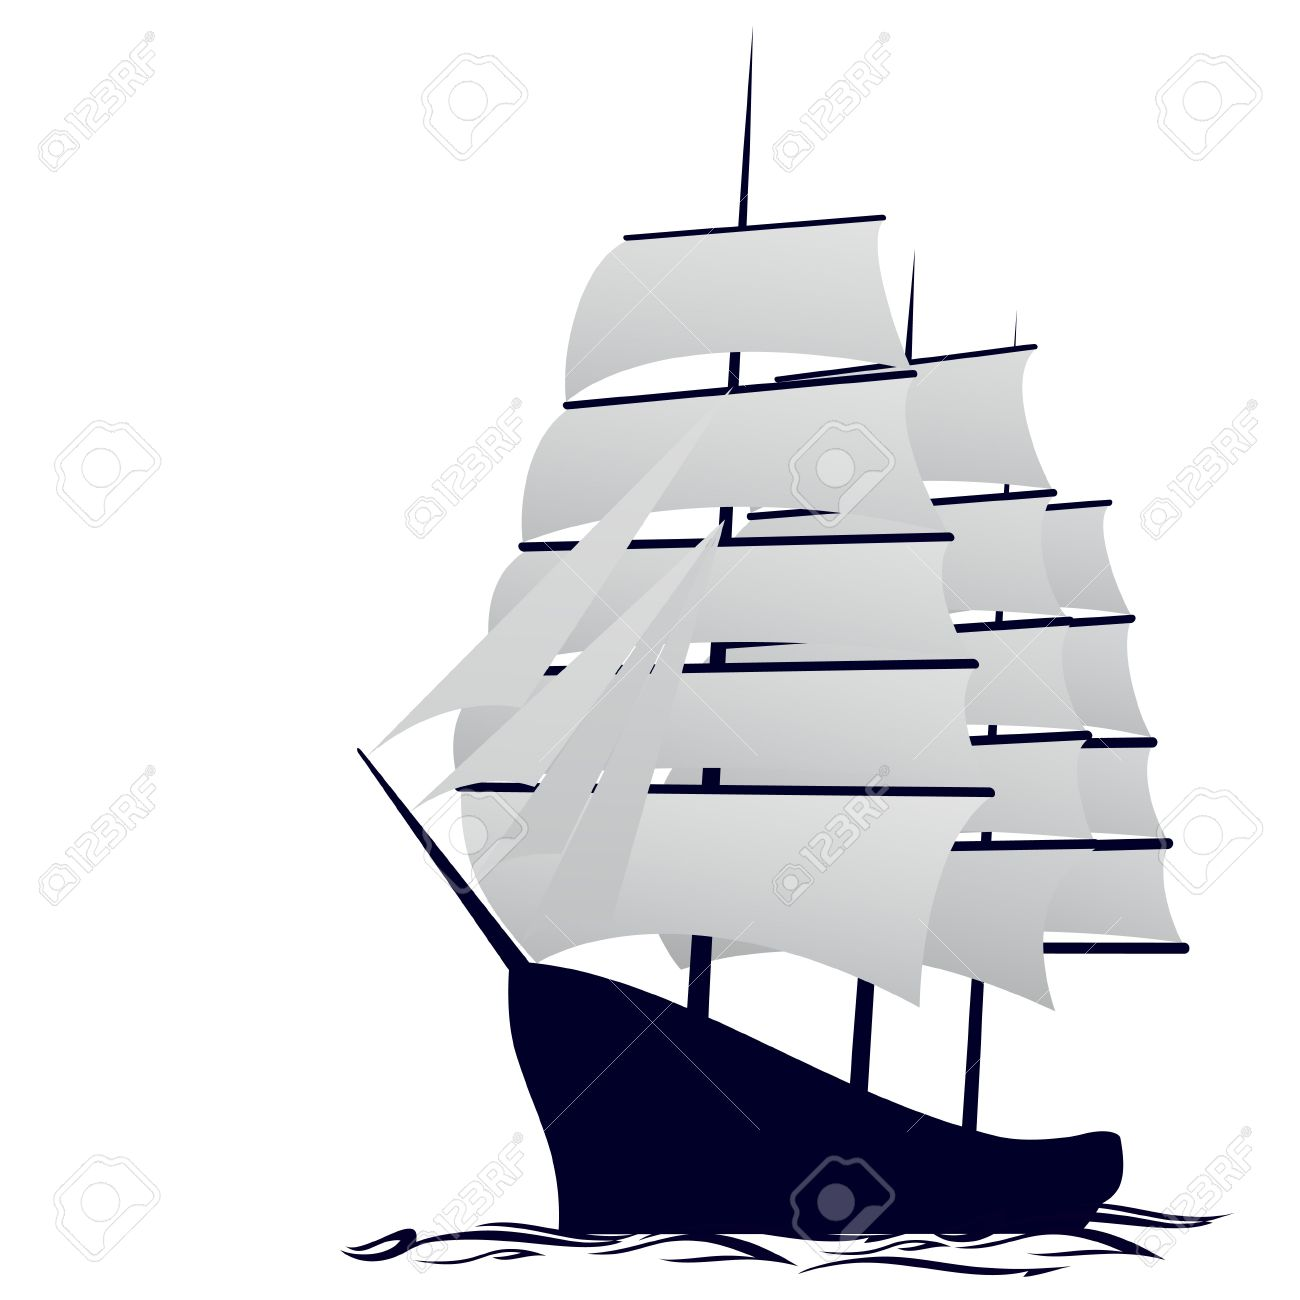 Ship mills clipart #8